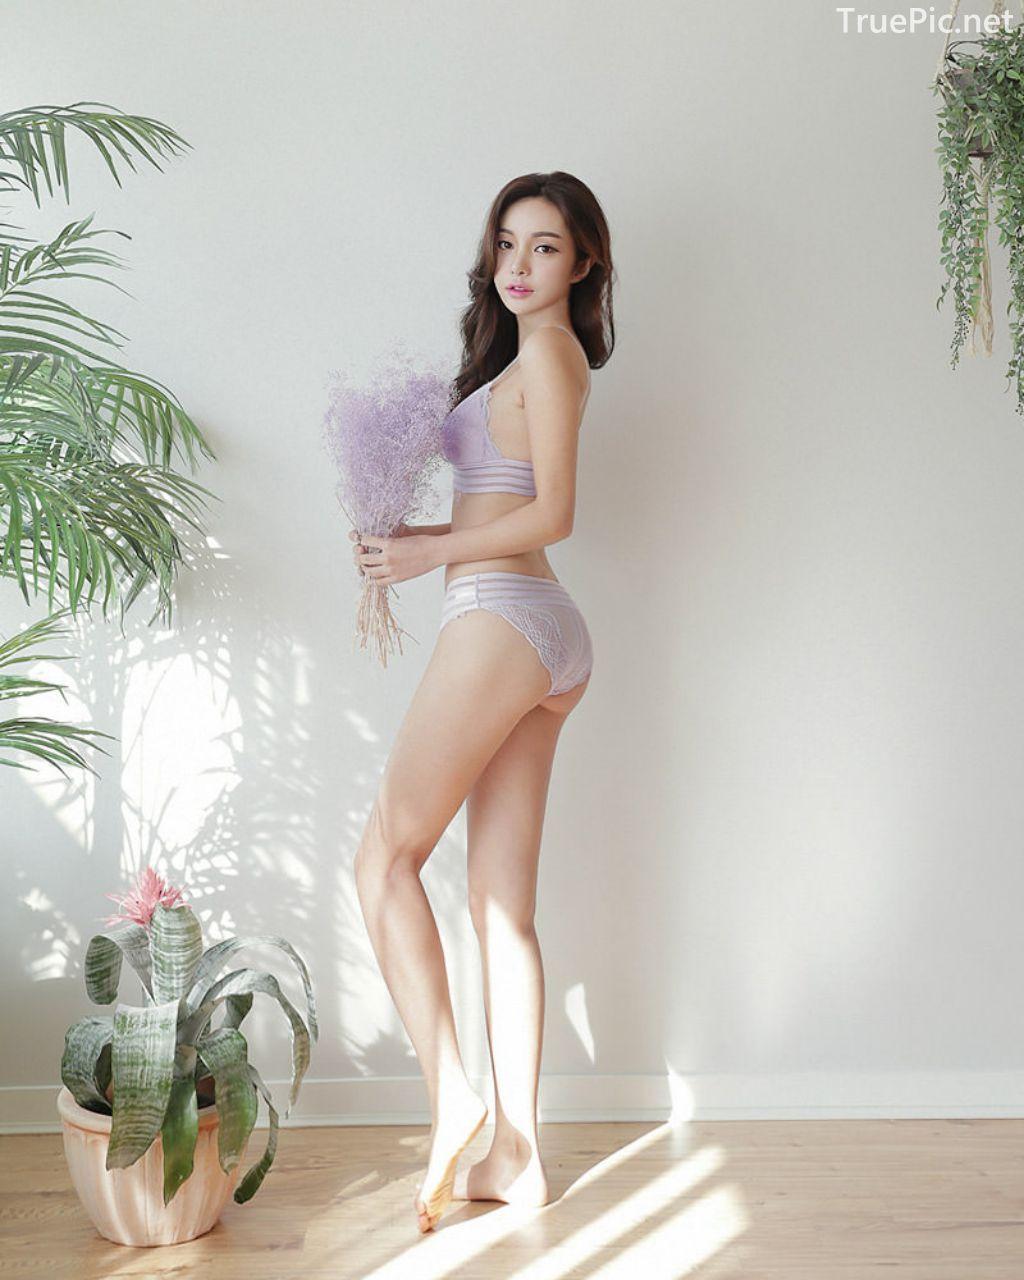 Jin Hee Korean Fashion Model - Love Me Lingerie Collection - TruePic.net - Picture 8